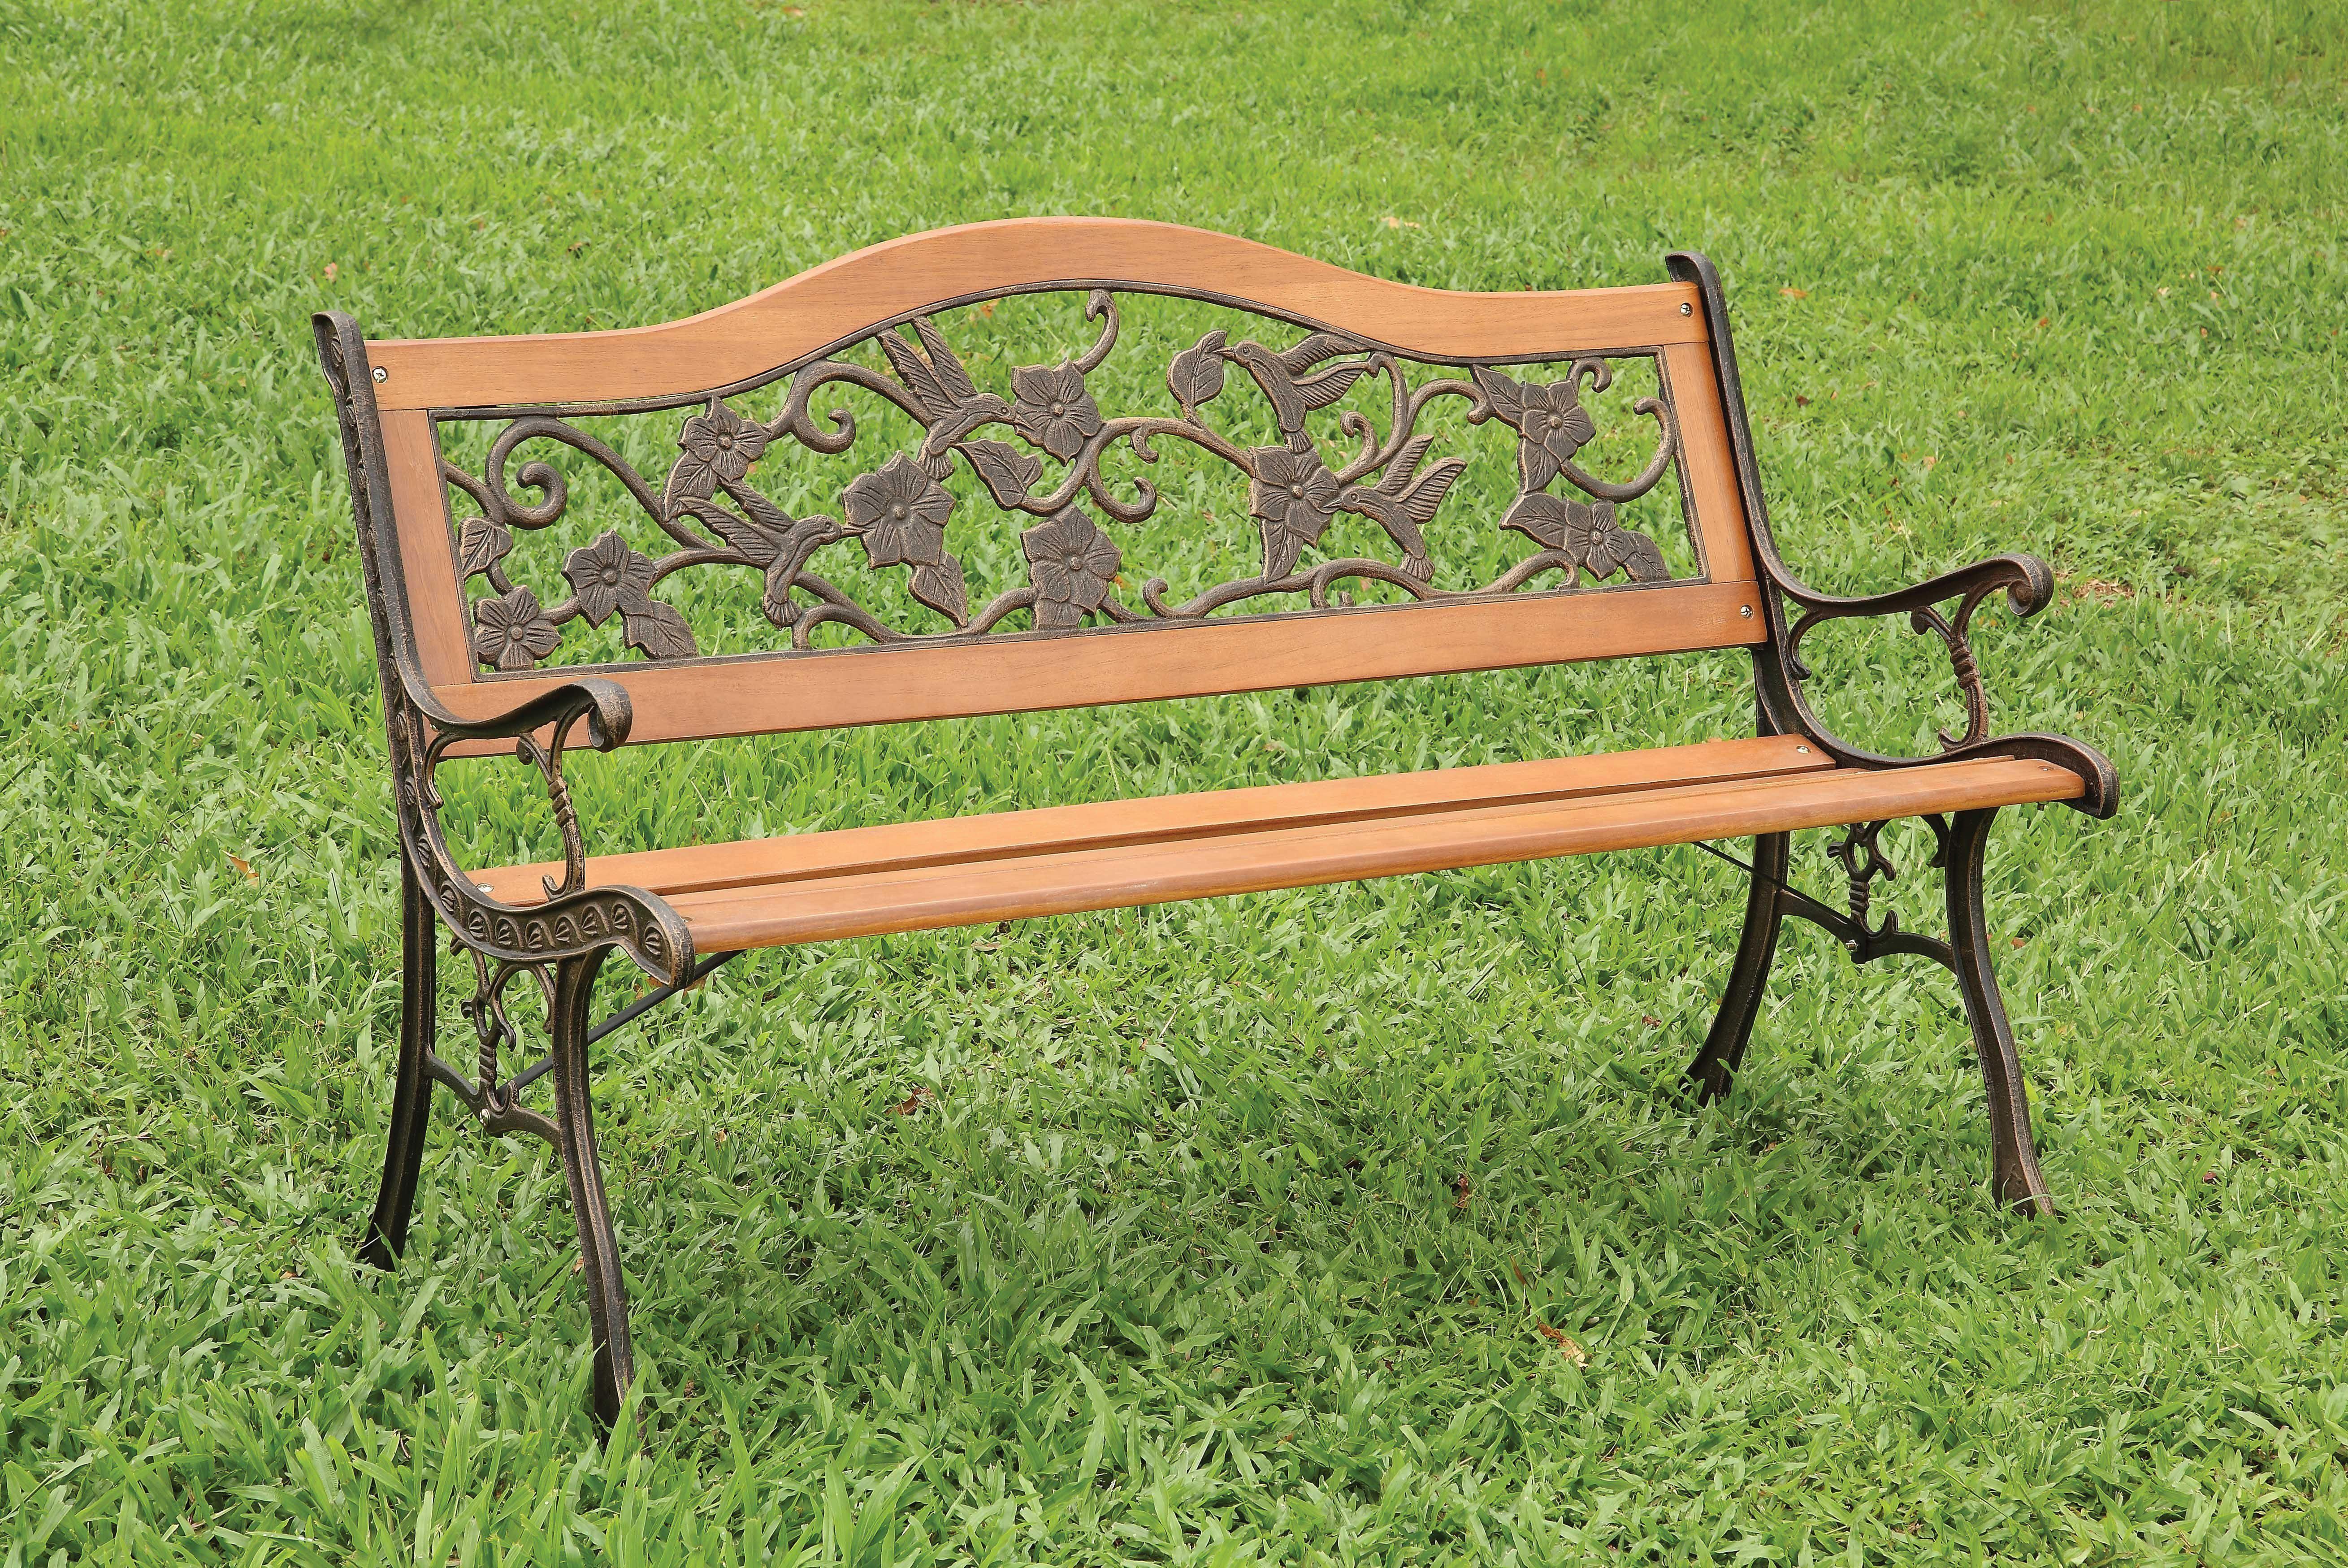 alverdon cottage style floral back outdoor patio bench outdoor garden bench patio bench metal garden benches